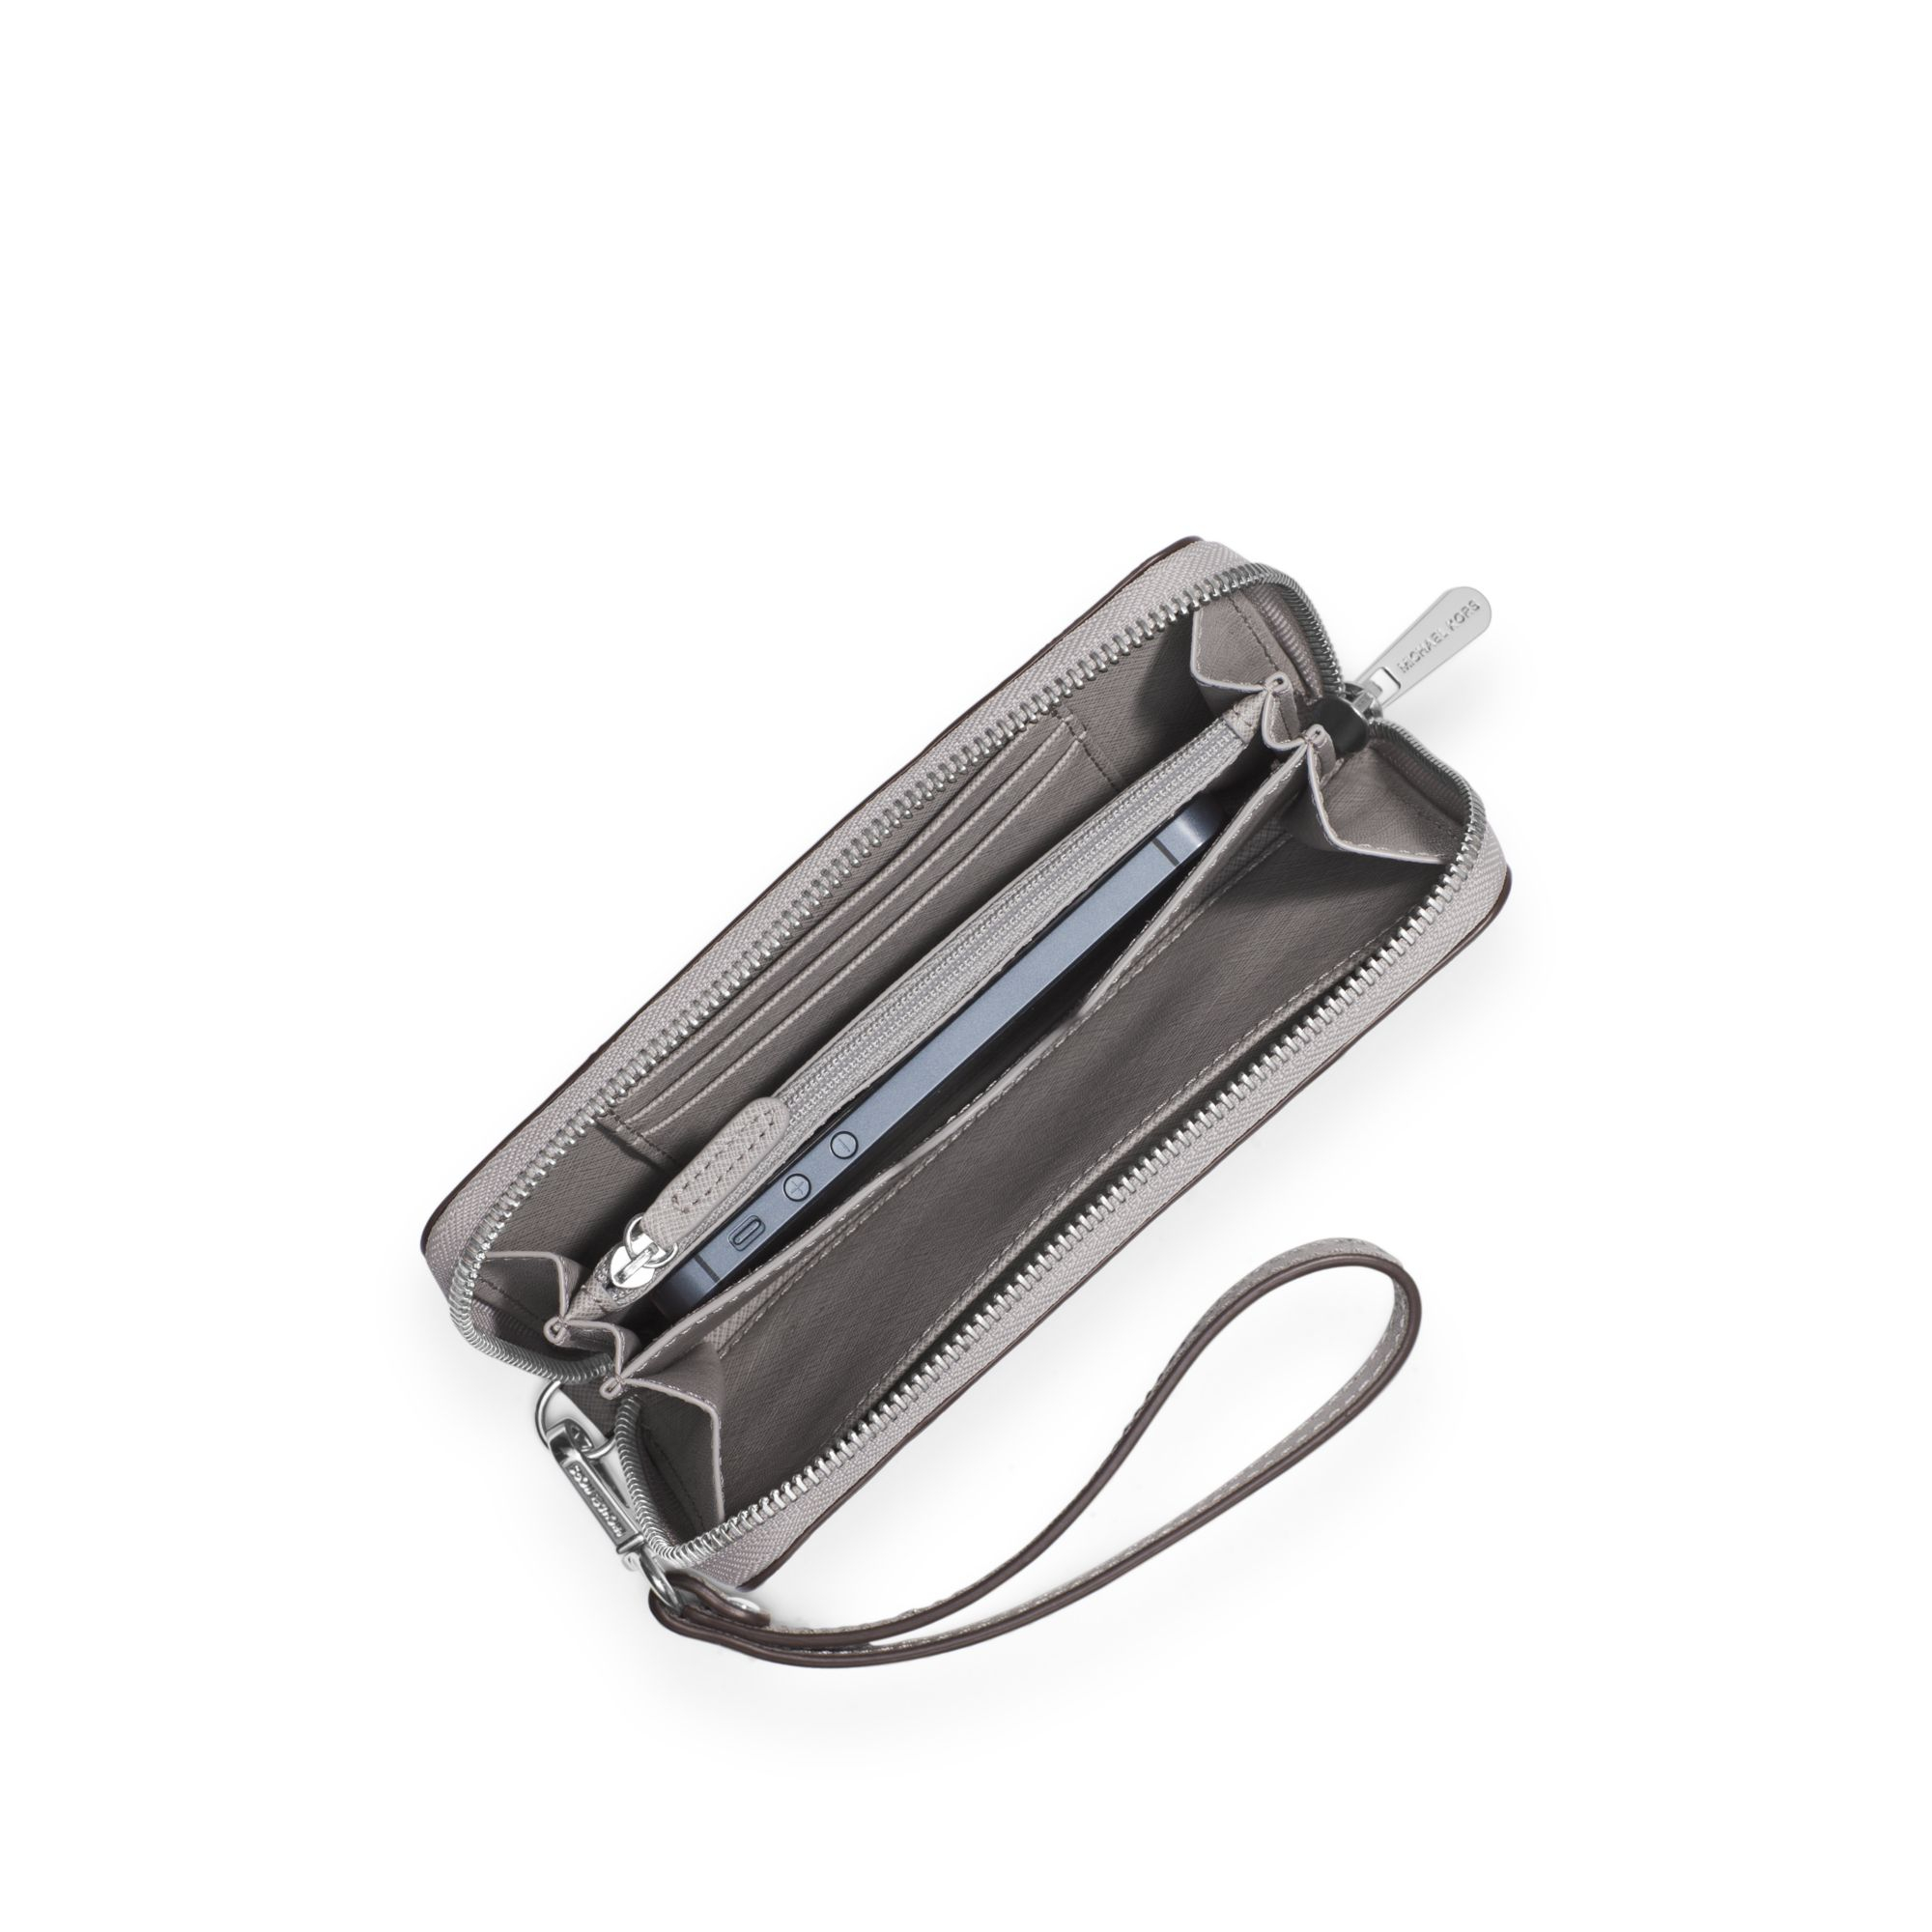 5de019e9b865 Michael Kors Jet Set Travel Micro-stud Saffiano Leather Smartphone ...